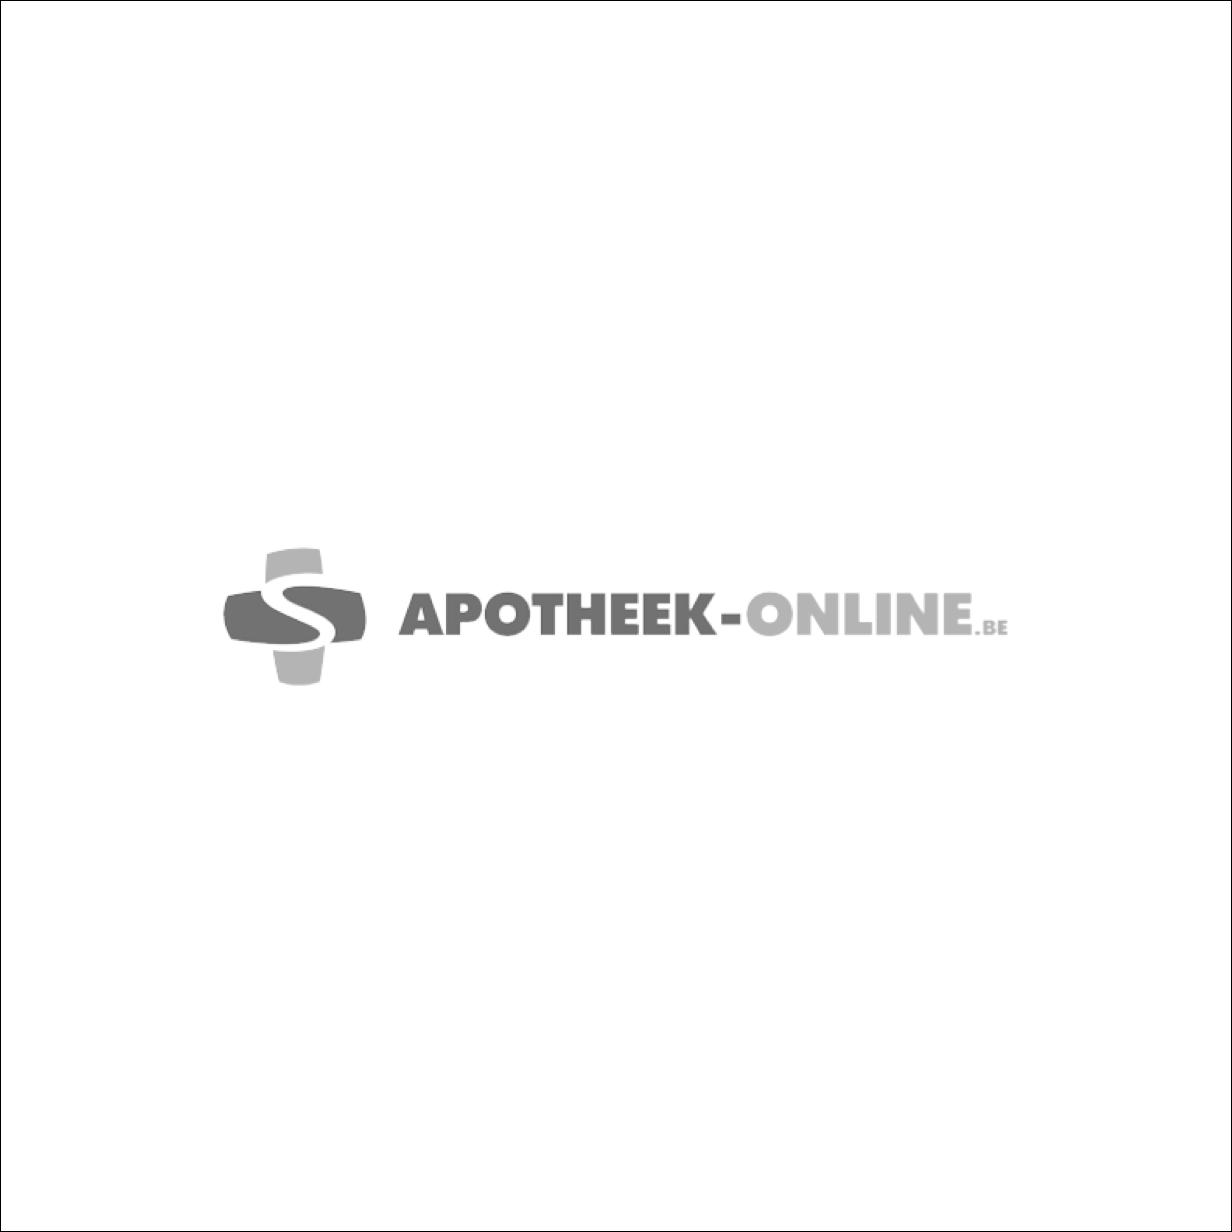 COMBIHESIVE IIS DURAHESIVE PL. 19-45MM 5 125028